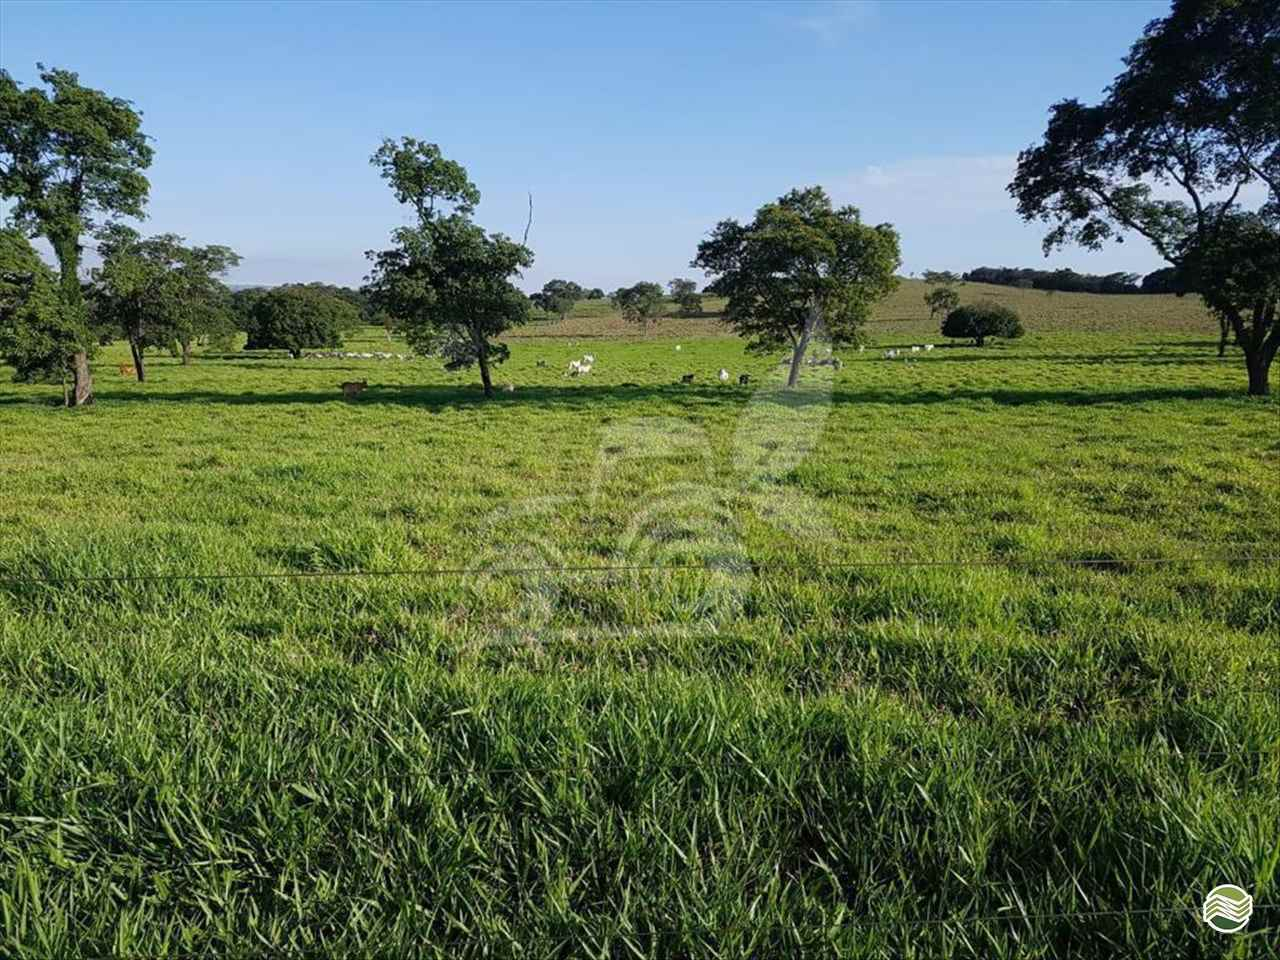 FAZENDAS de EP Máquinas e Implementos Agrícolas - CRISTALINA/GO